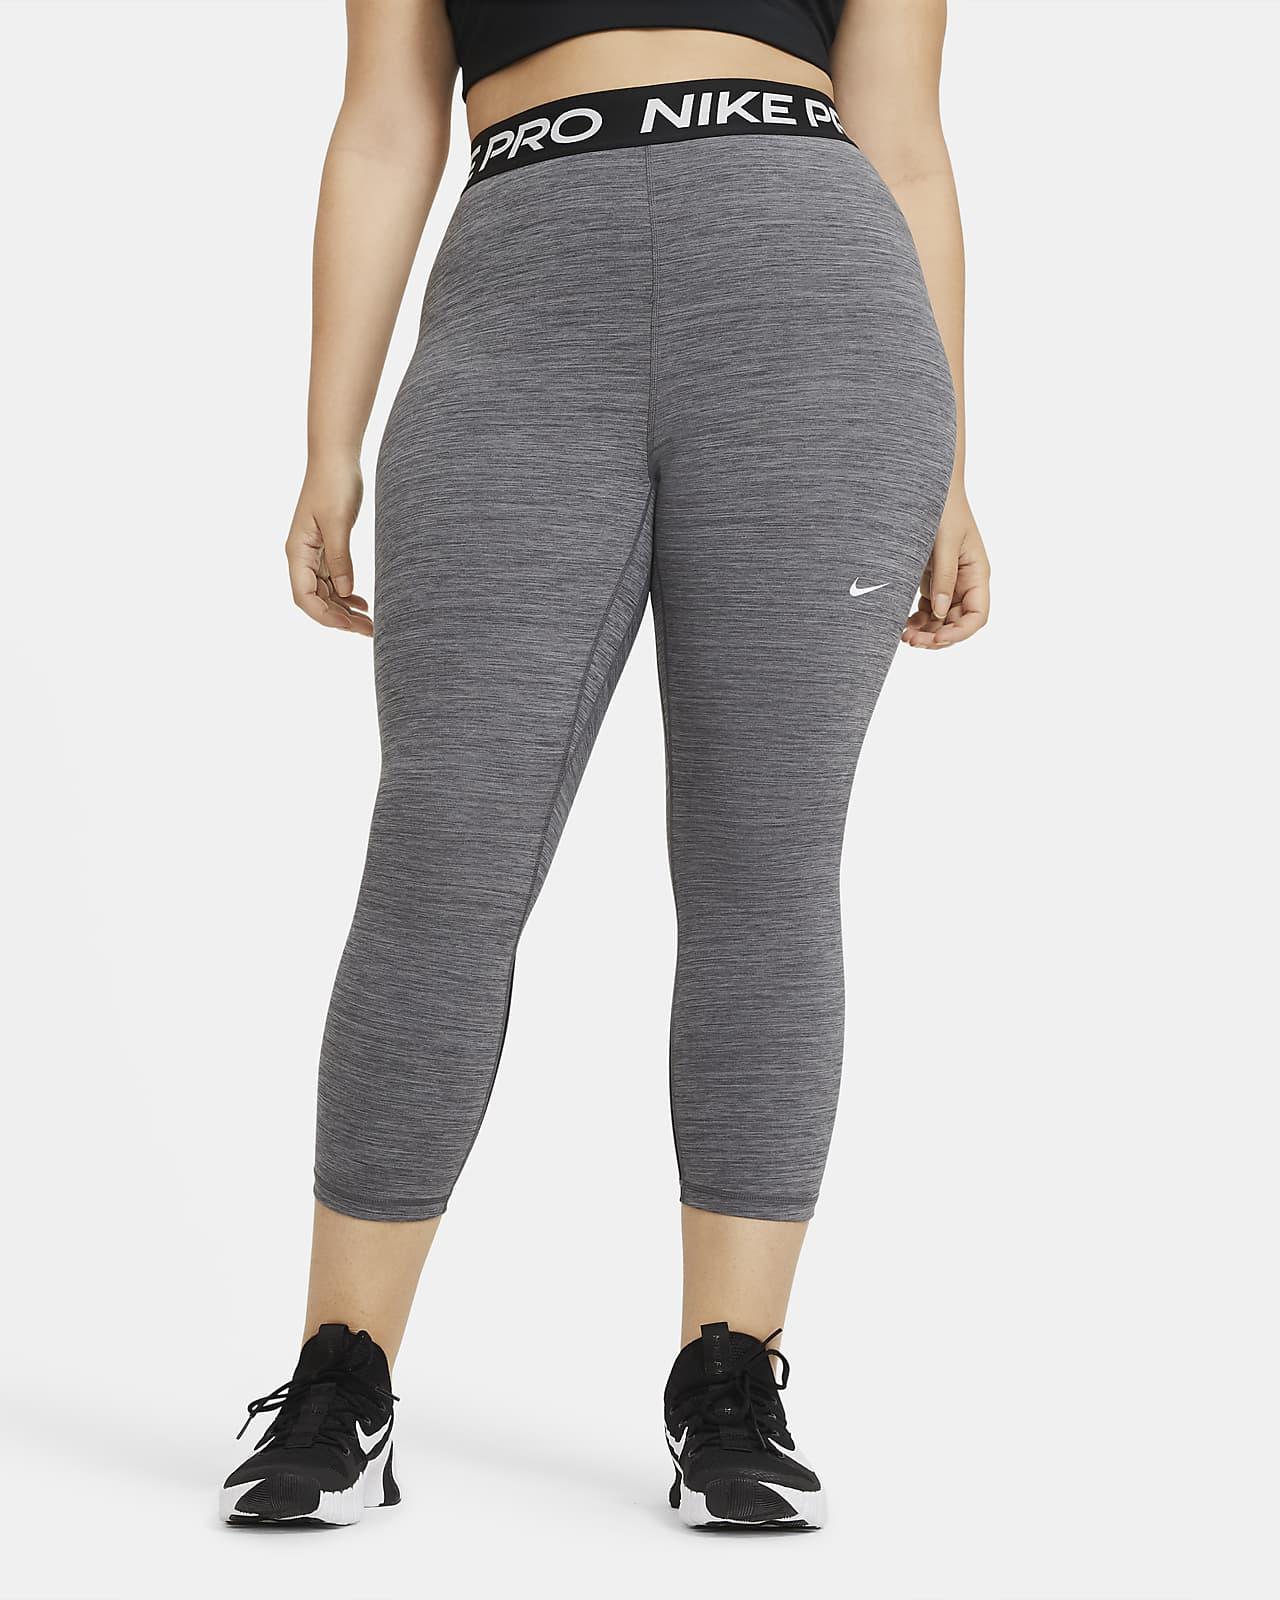 Leggings cropped de tiro medio para mujer (talla grande) Nike Pro